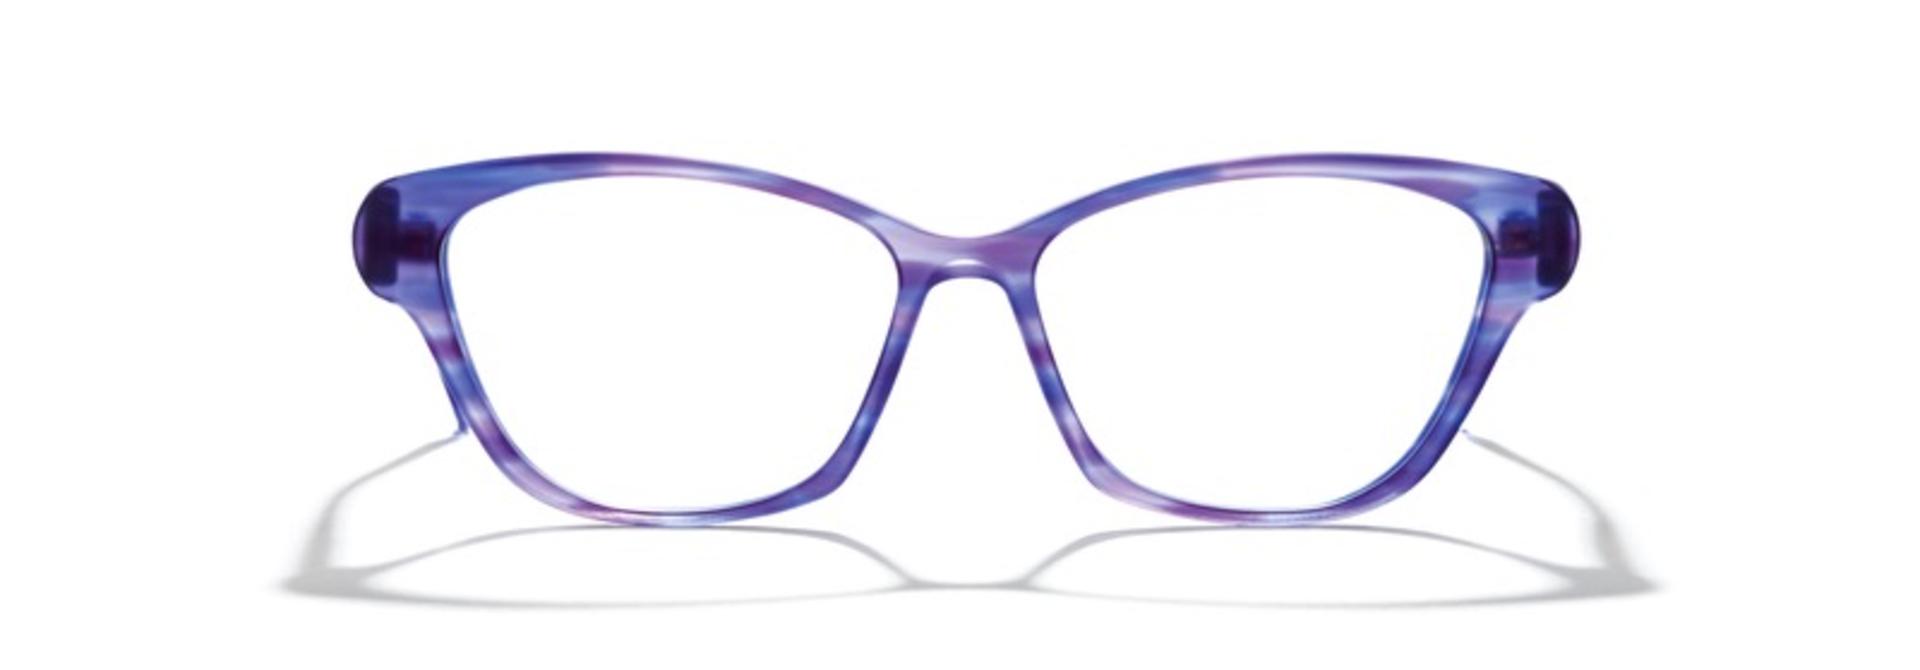 Bevel Violetta 3693